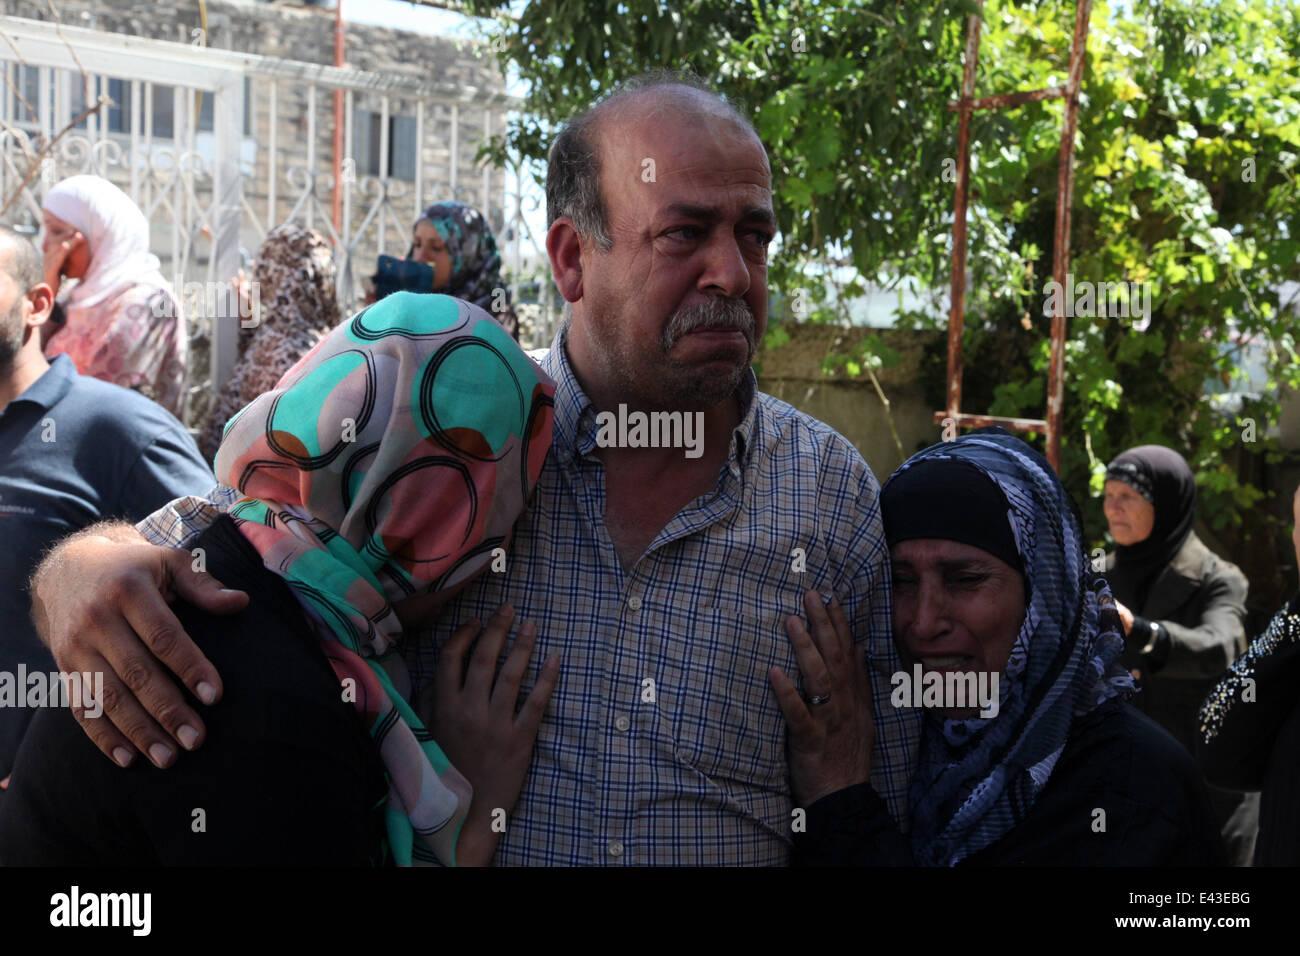 July 2, 2014 - Shuafat, Jerusalem - Relatives of Mohammed Abu Khudair, mourn in Shuafat, an Arab suburb of Jerusalem. - Stock Image